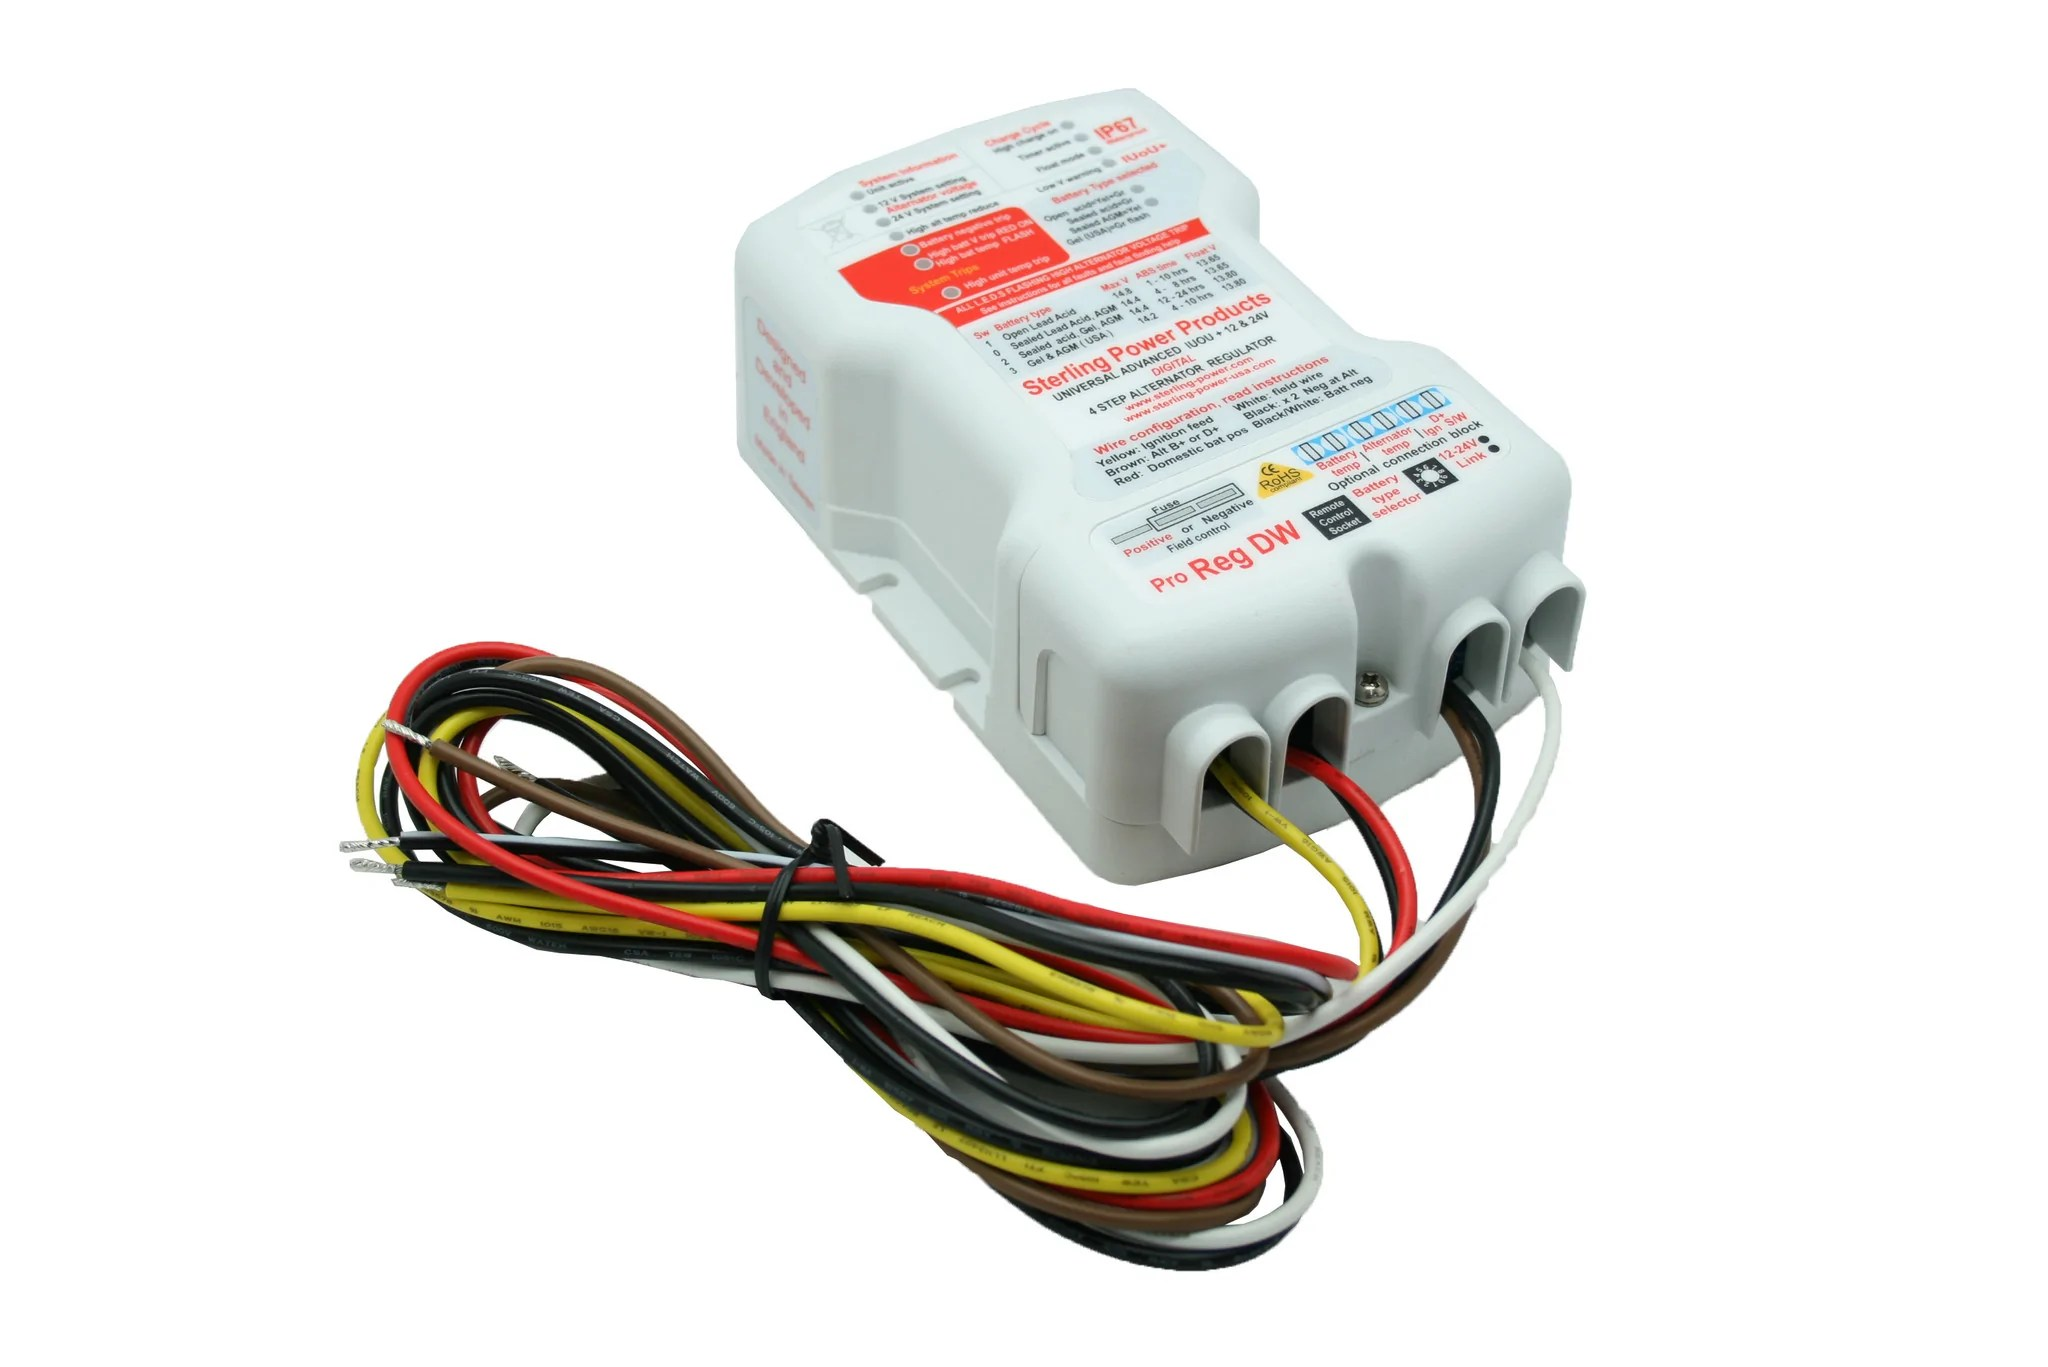 small resolution of universal advanced digital alternator regulator pro reg dw waterproof pdarw 220 80 products